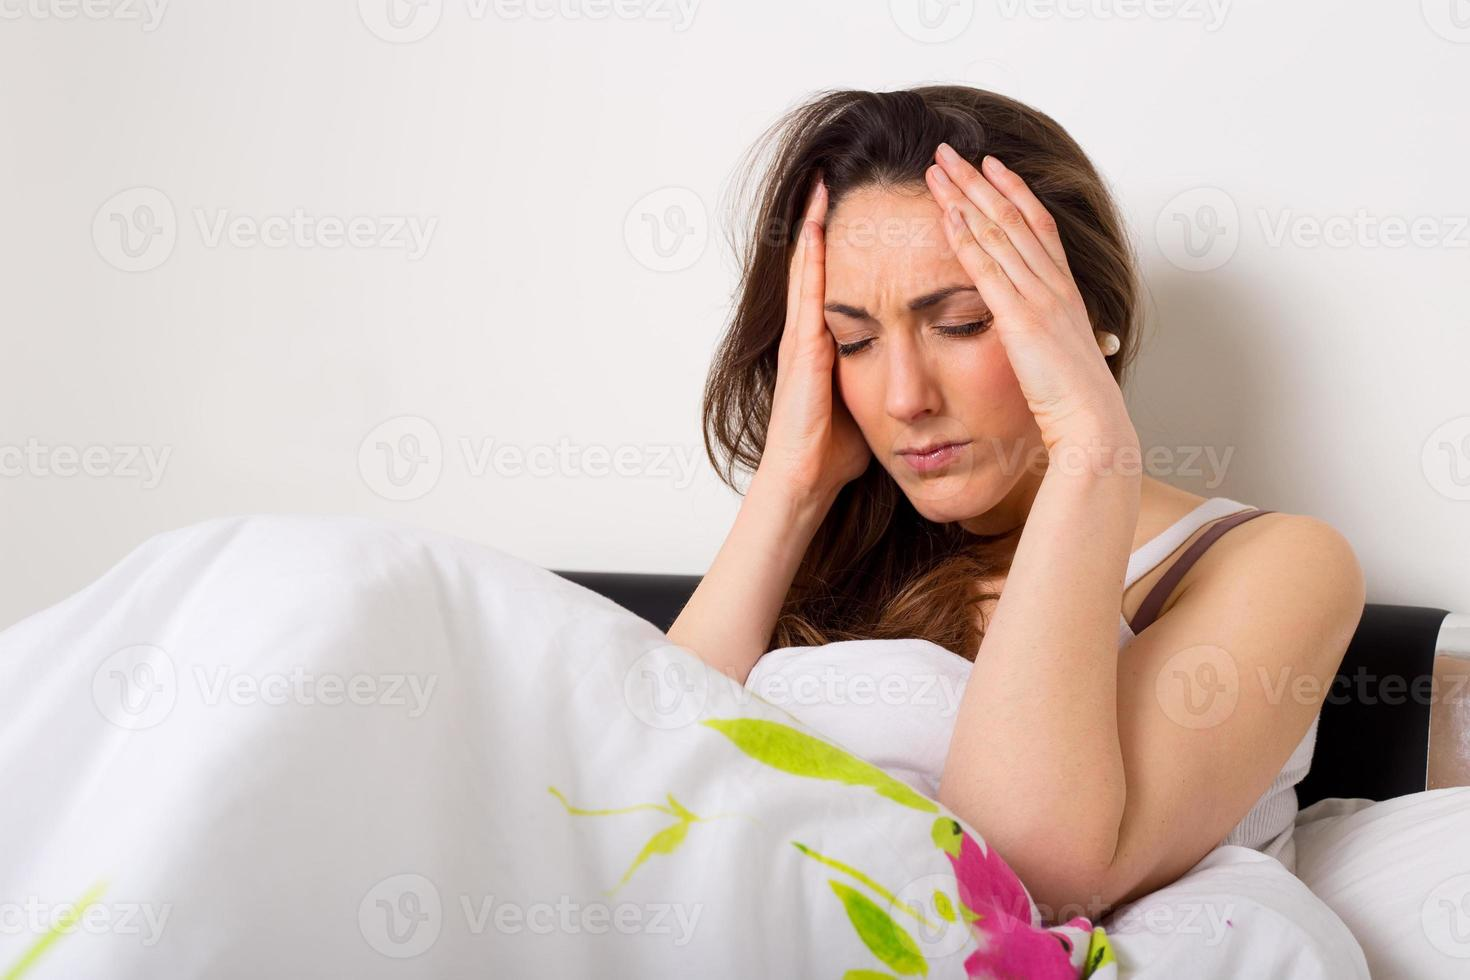 dolor de cabeza foto